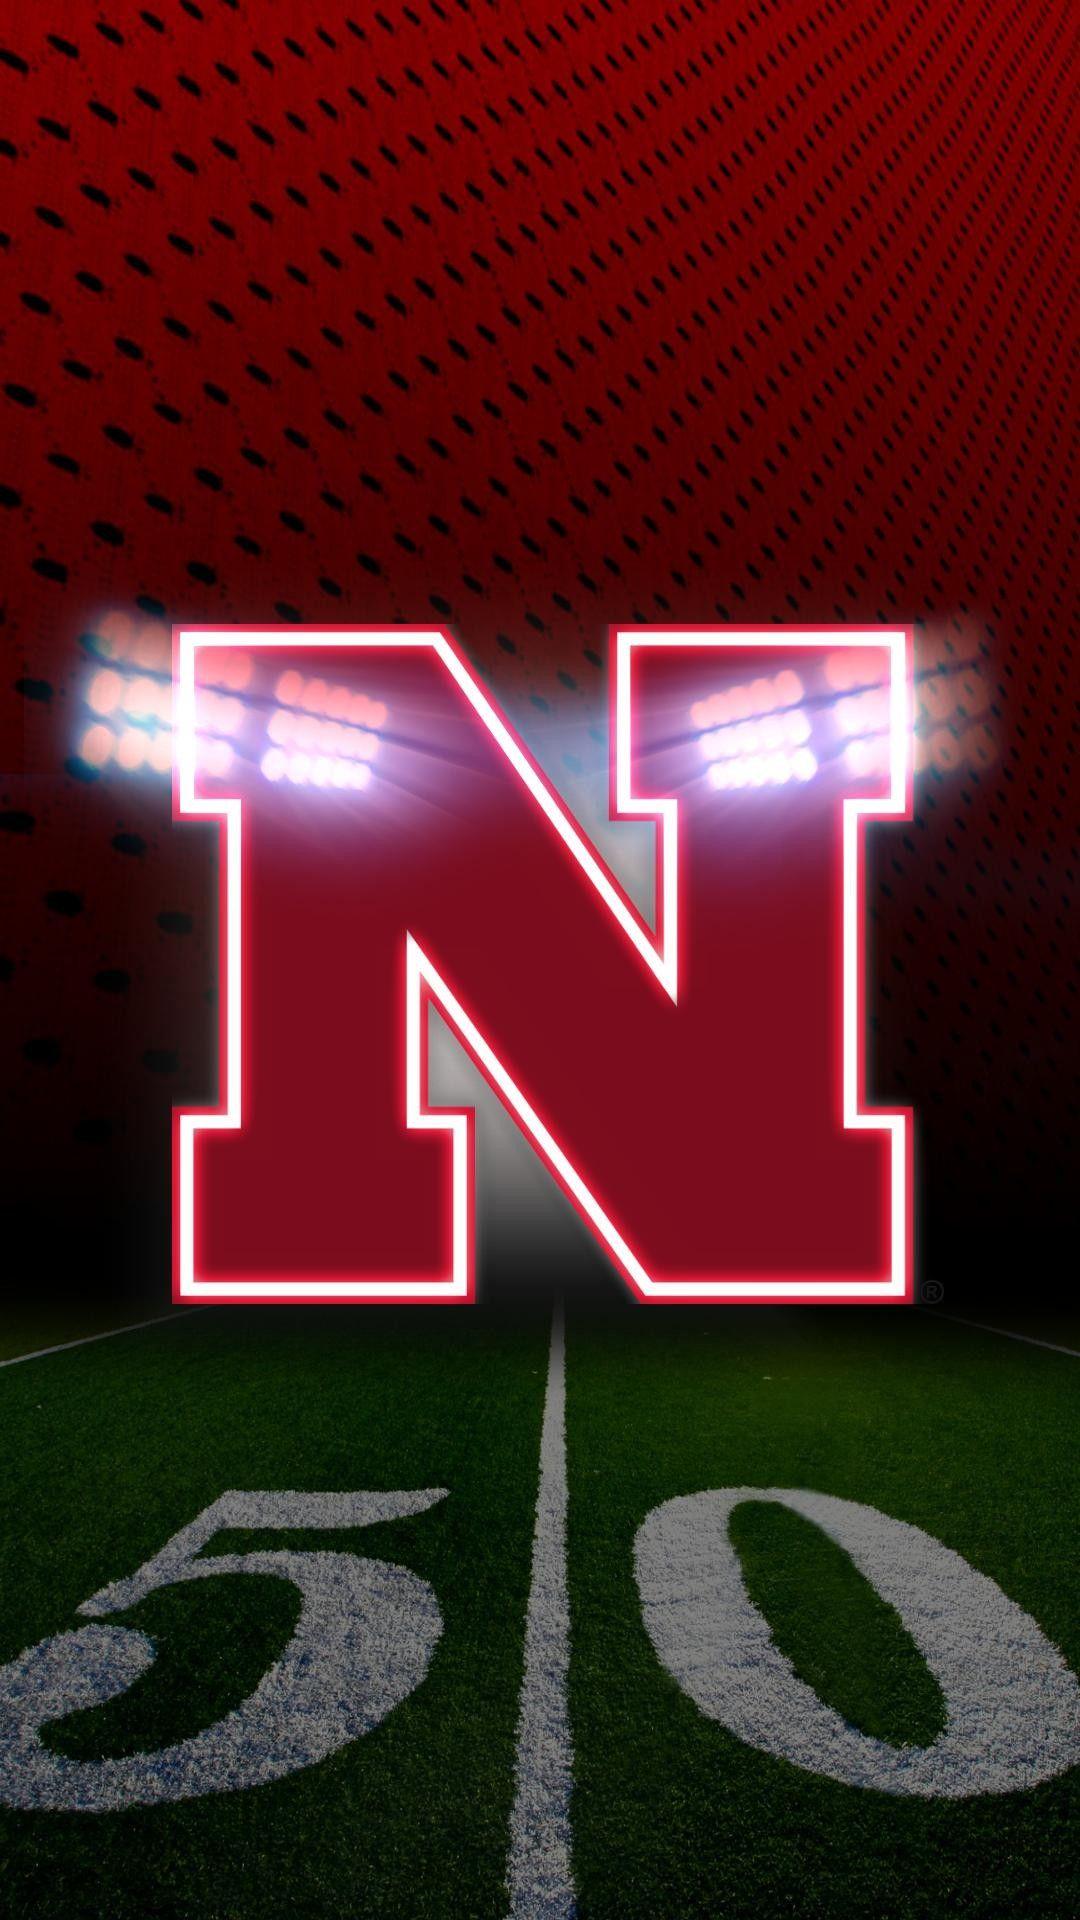 Pin by Jeremy on Husker Nebraska cornhuskers football Football 1080x1920